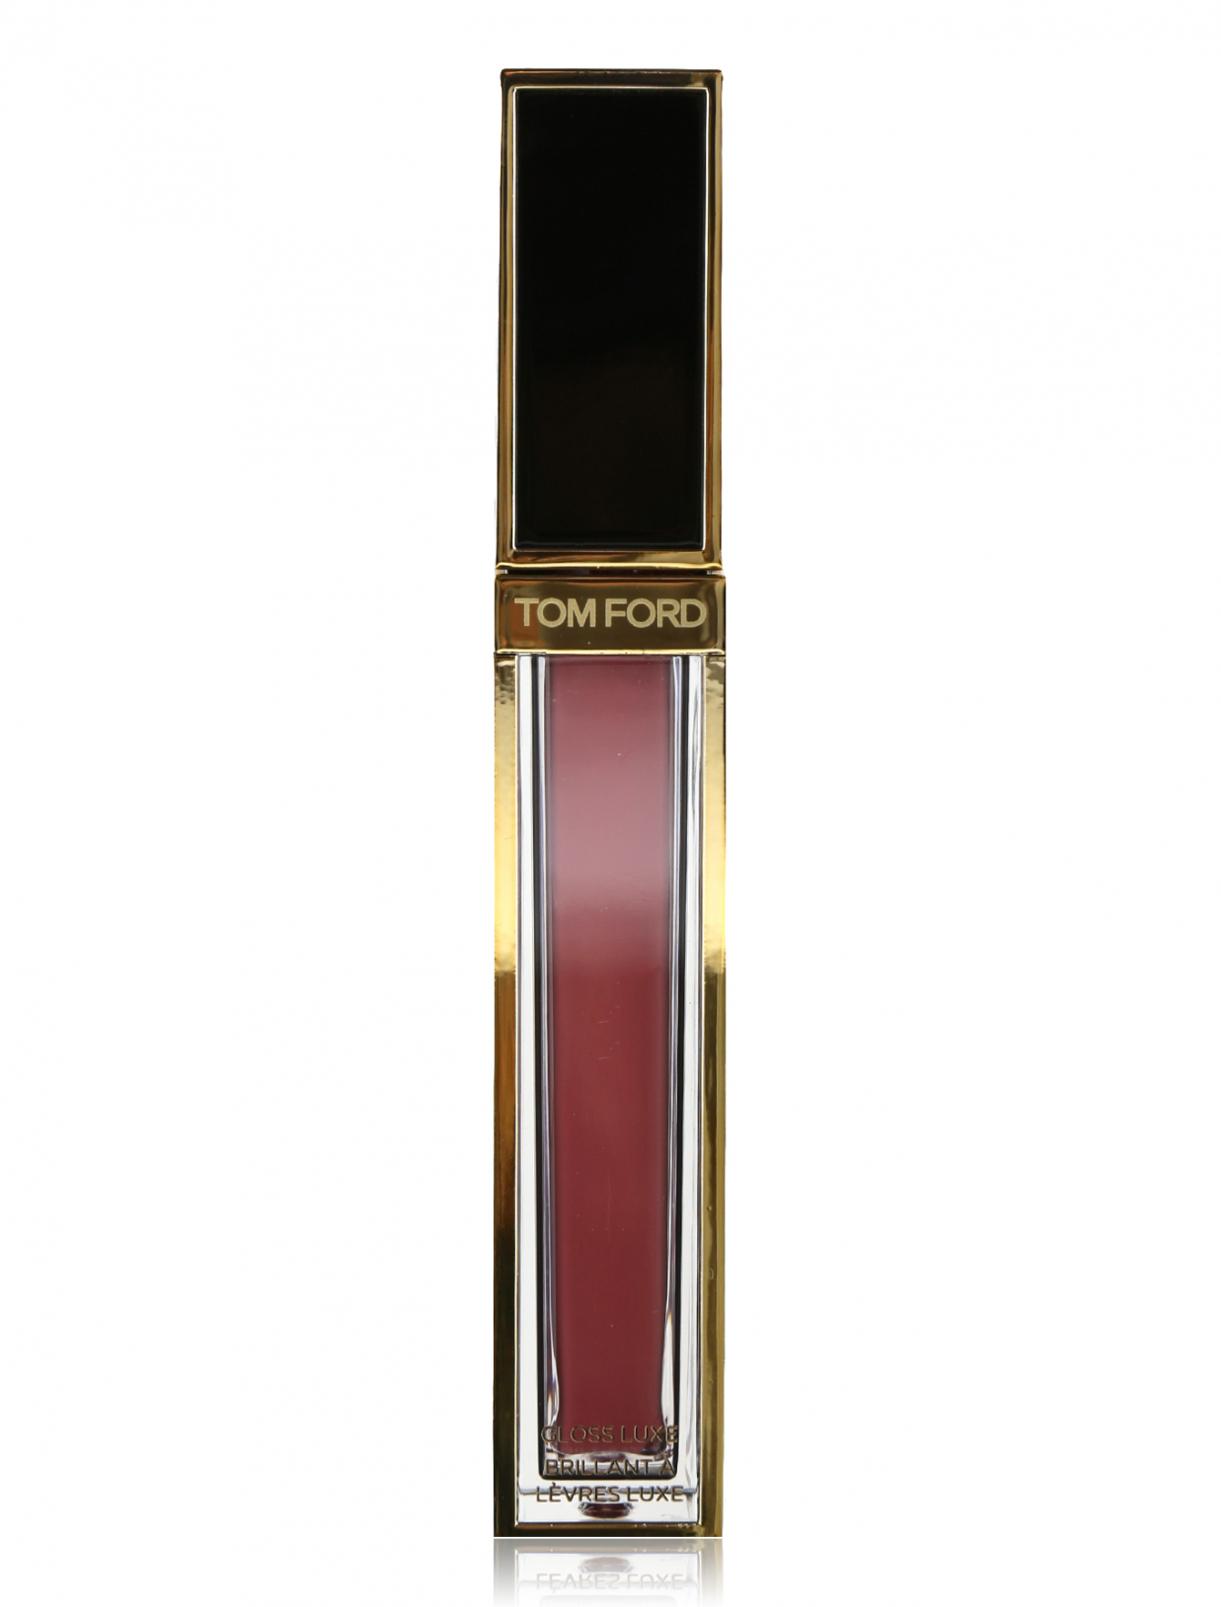 Блеск для губ Gloss Luxe, 11 GRATUITOUS, 5,5 мл Tom Ford  –  Общий вид